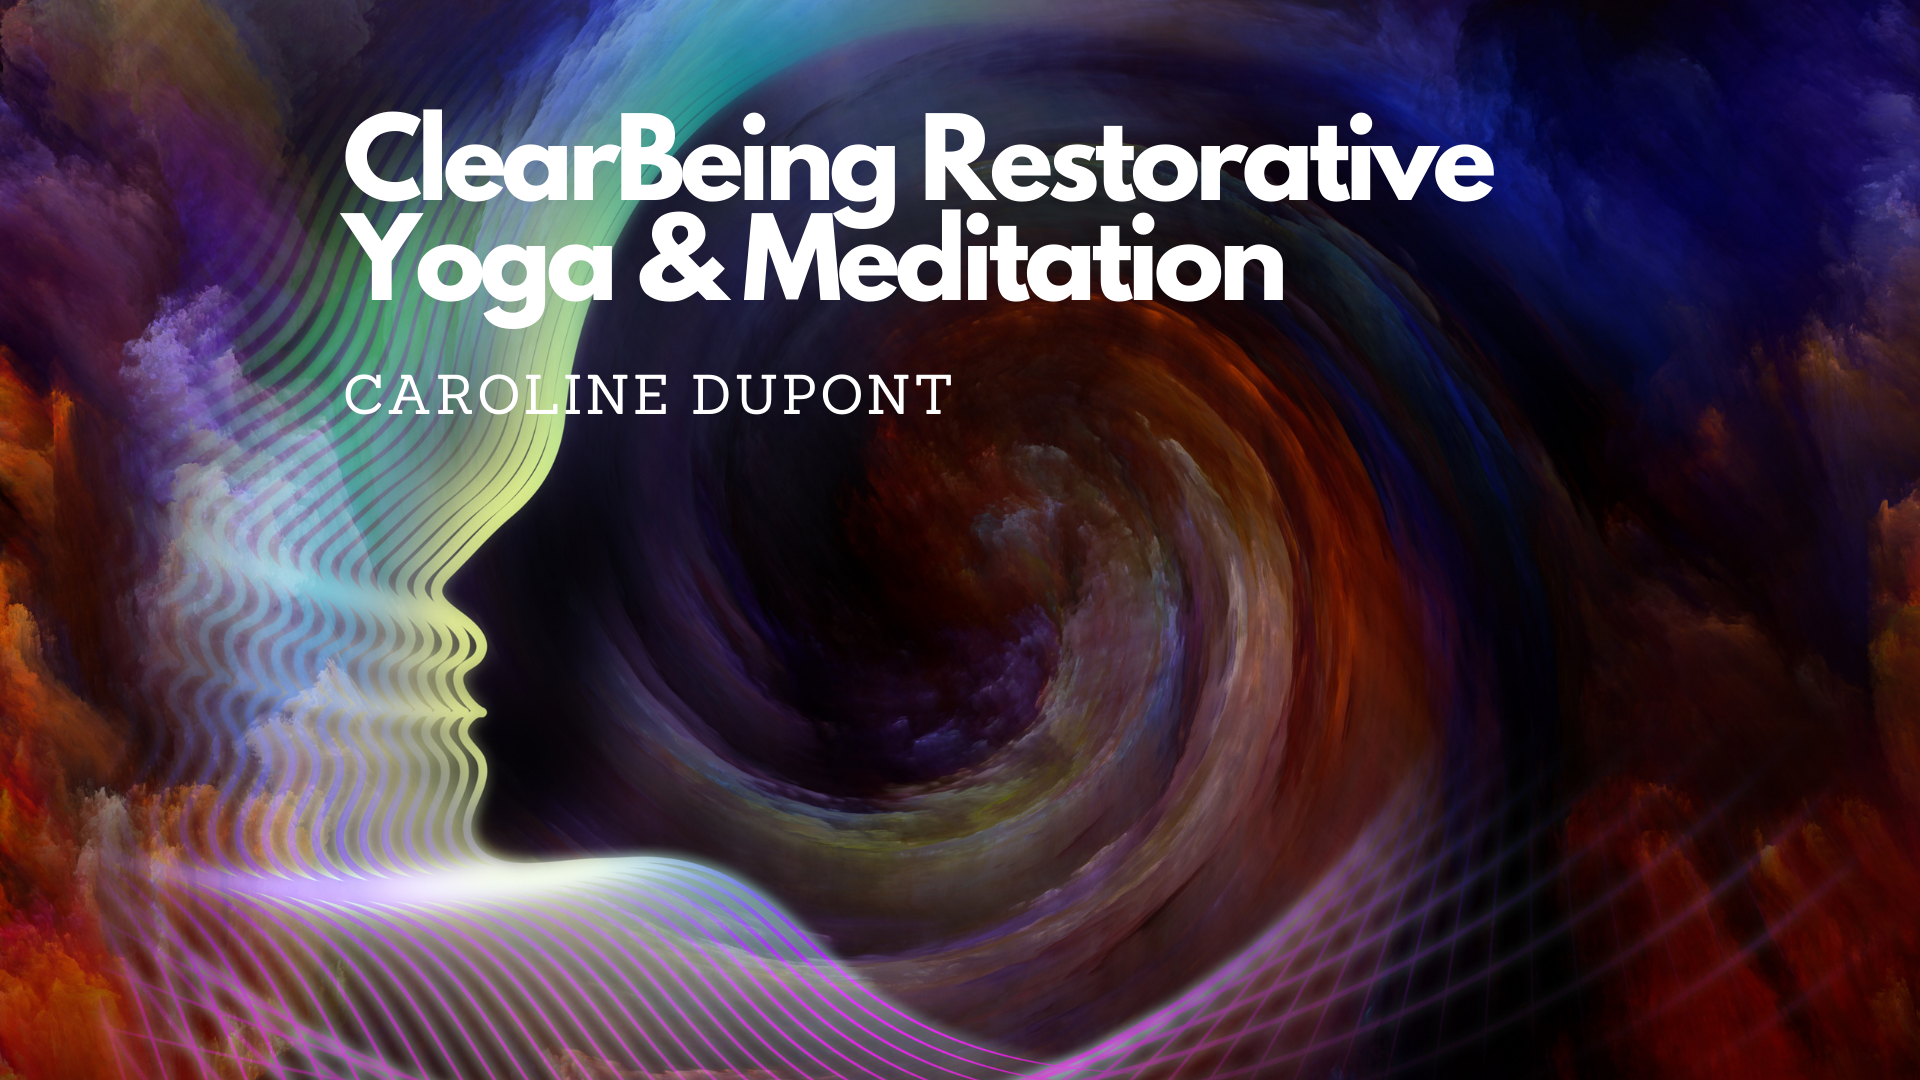 ClearBeing Restorative Yoga & Meditation with Caroline Dupont